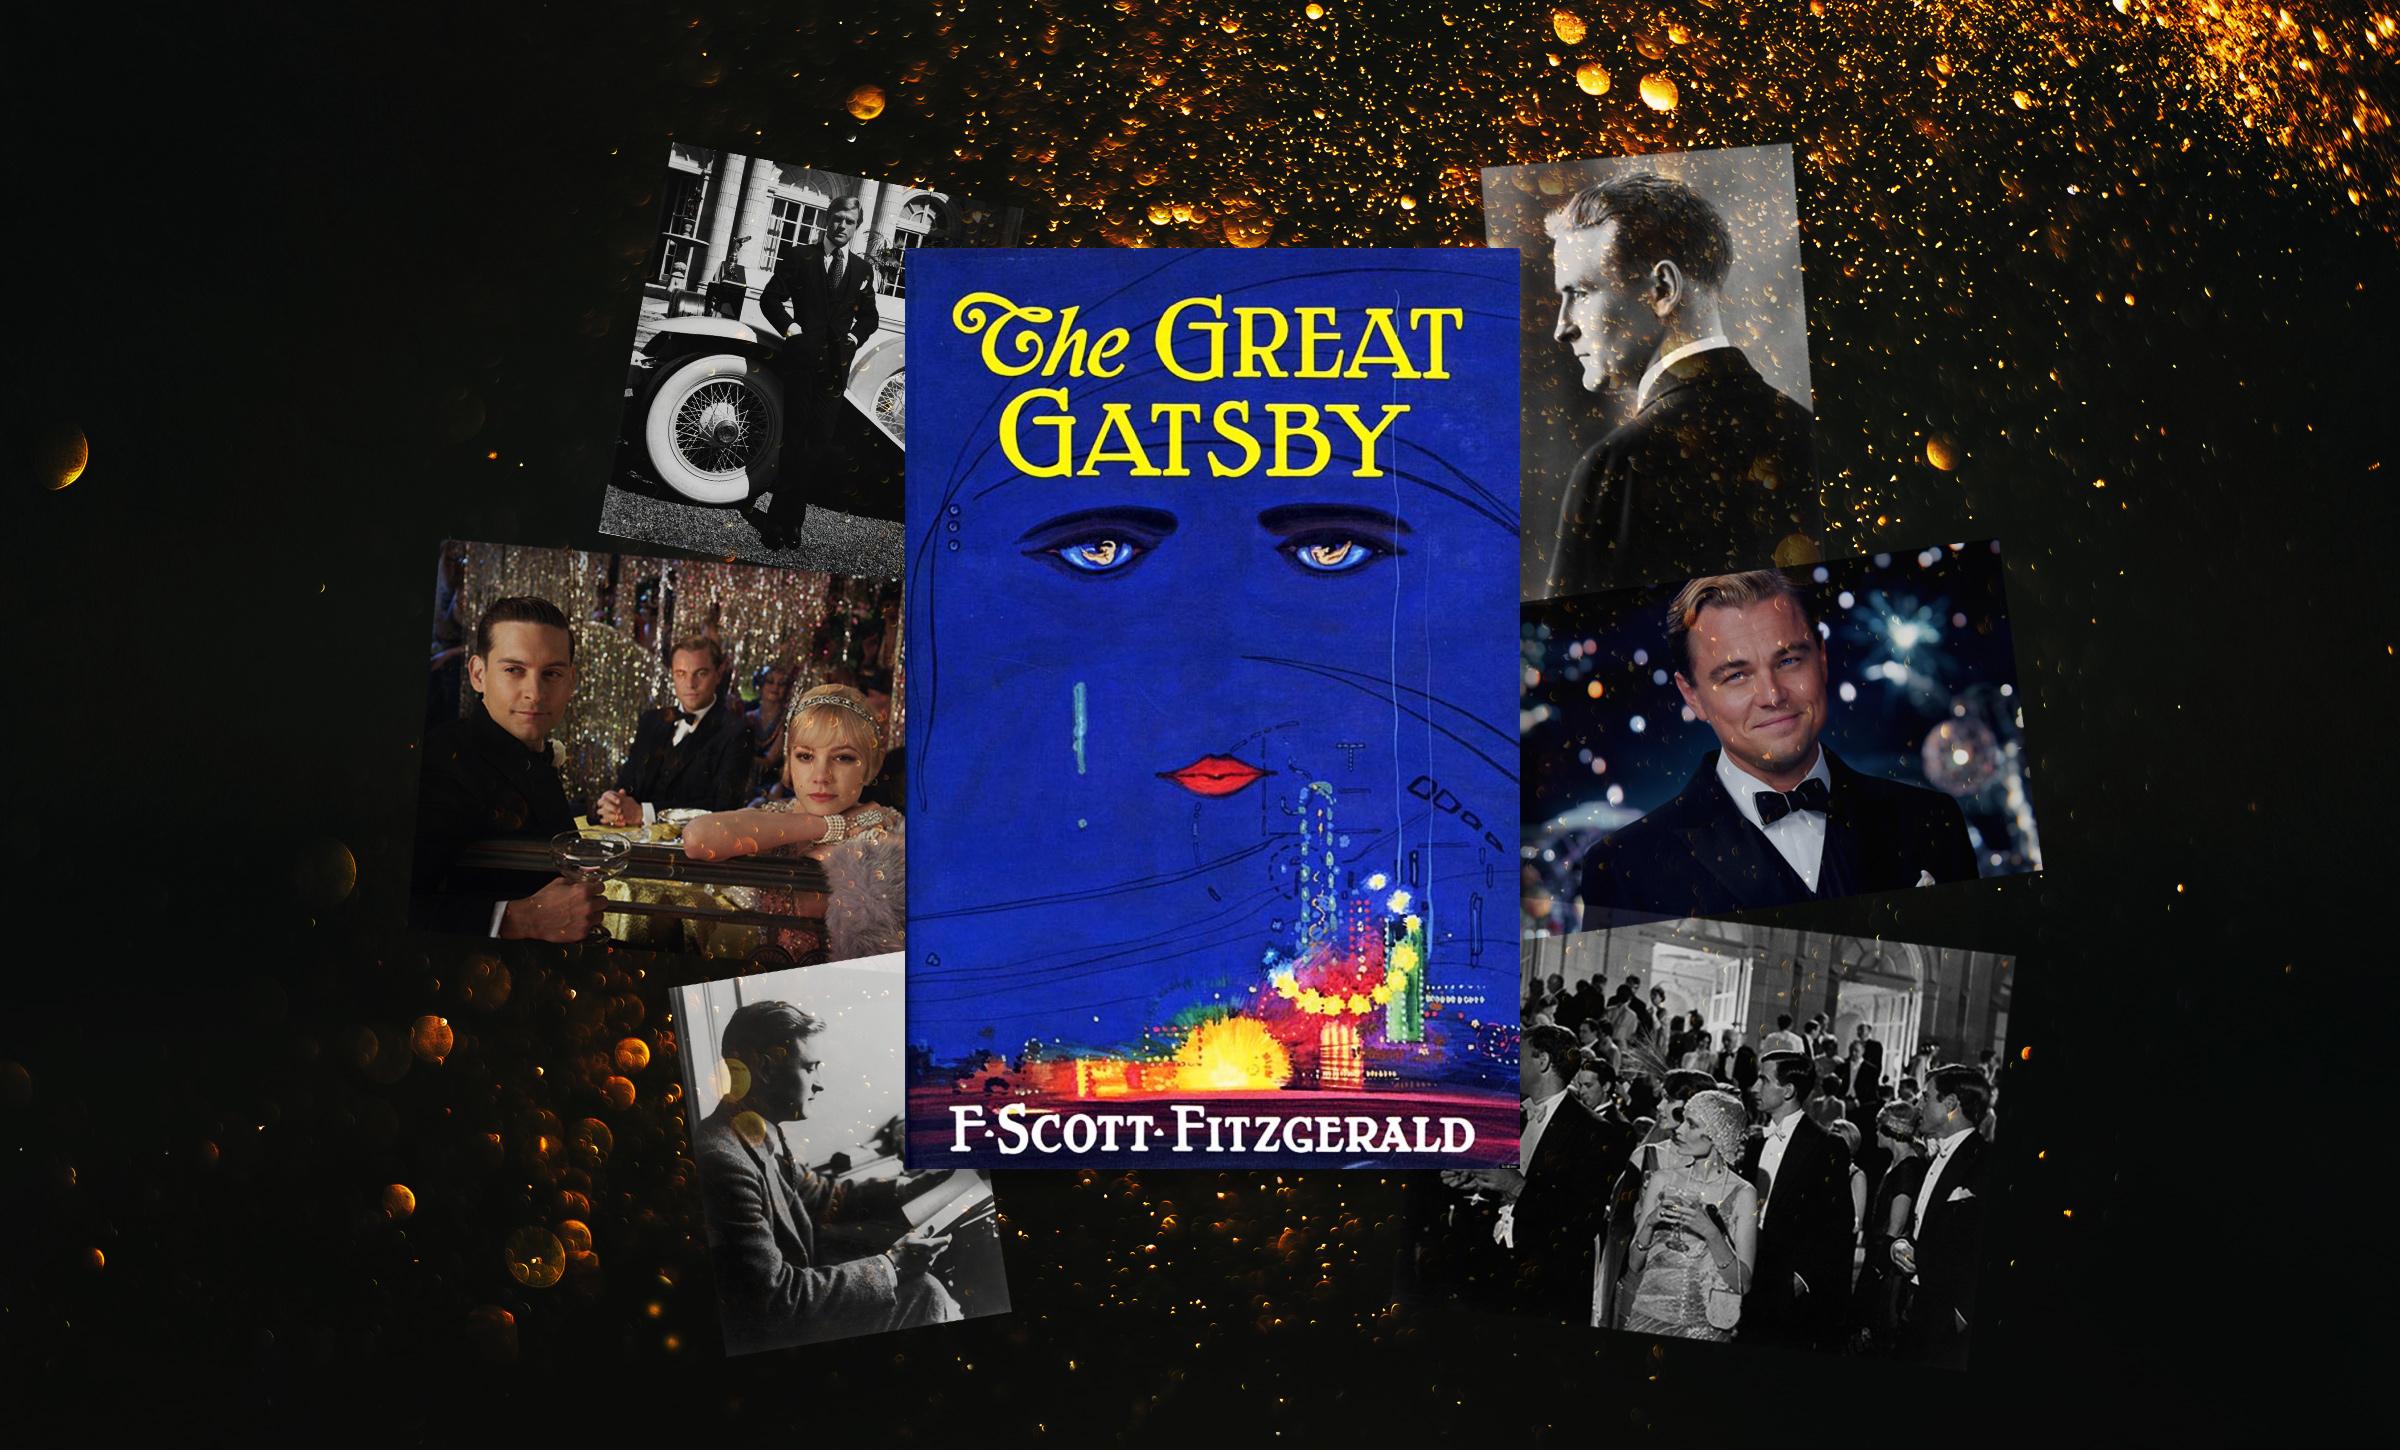 The Great Gatsby, by F. Scott Fitzgerald